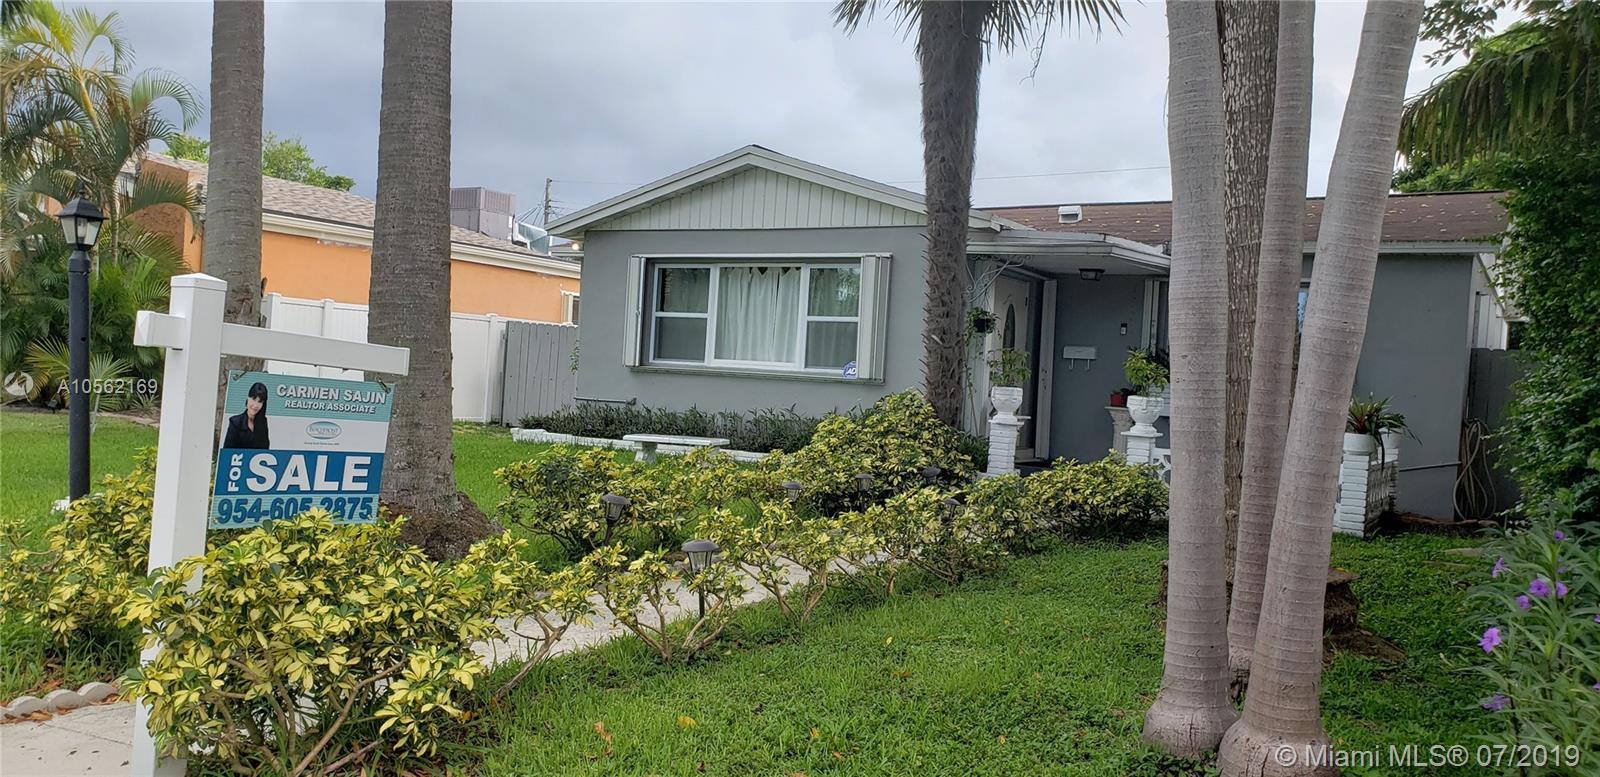 1531 Johnson St, Hollywood FL 33020